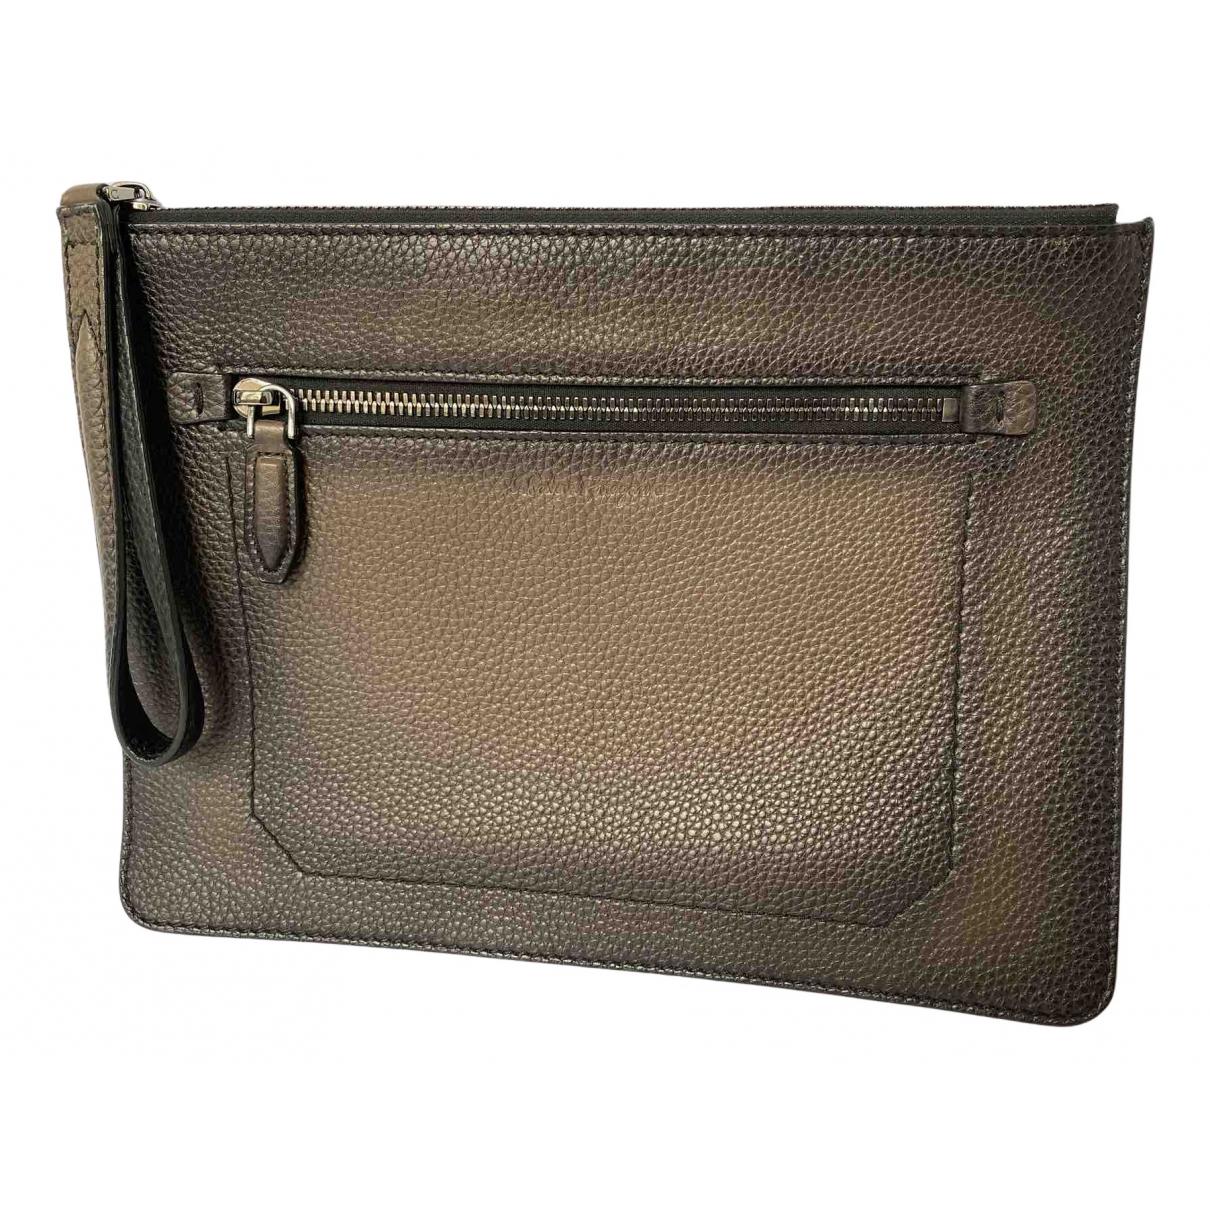 Salvatore Ferragamo N Grey Leather Small bag, wallet & cases for Men N